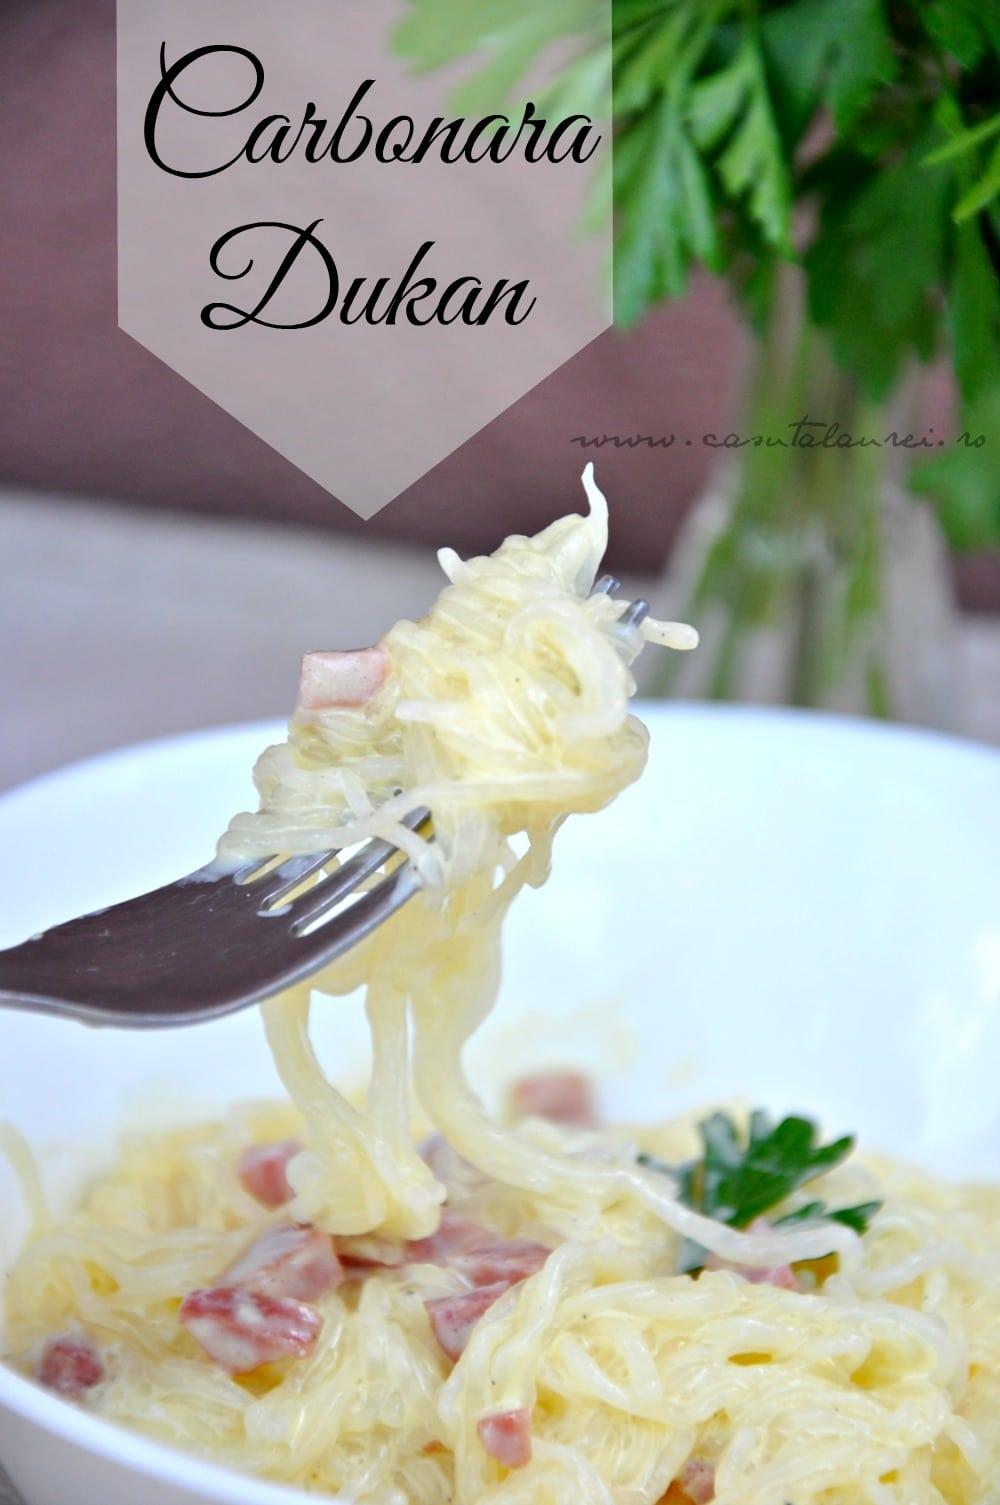 Paste alla Carbonara - Dukan style